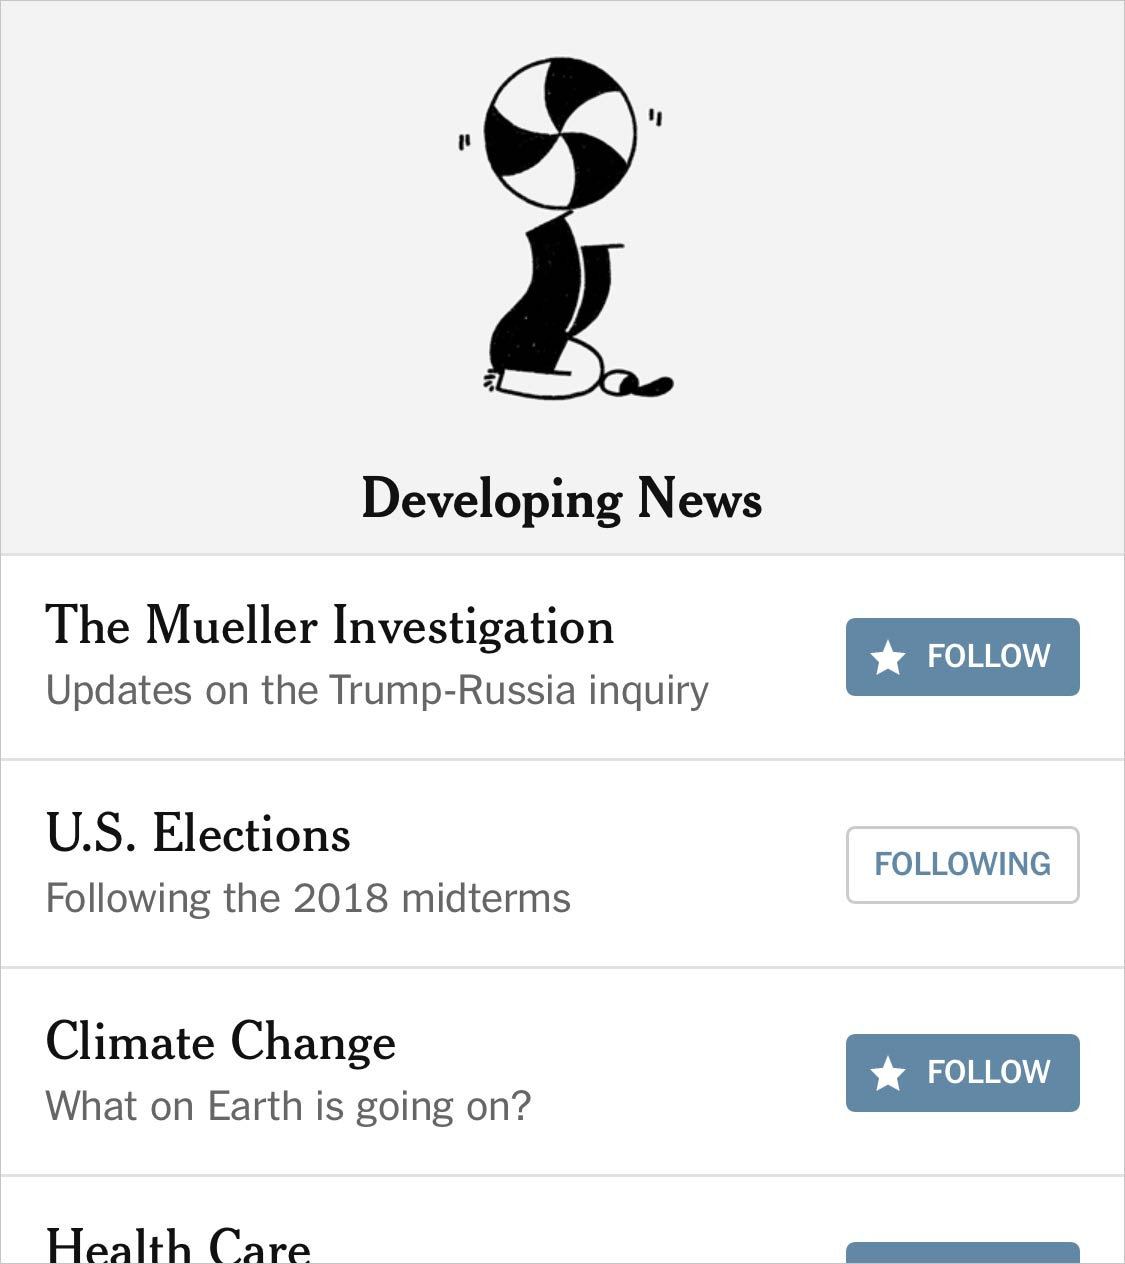 DevelopingNews.jpg